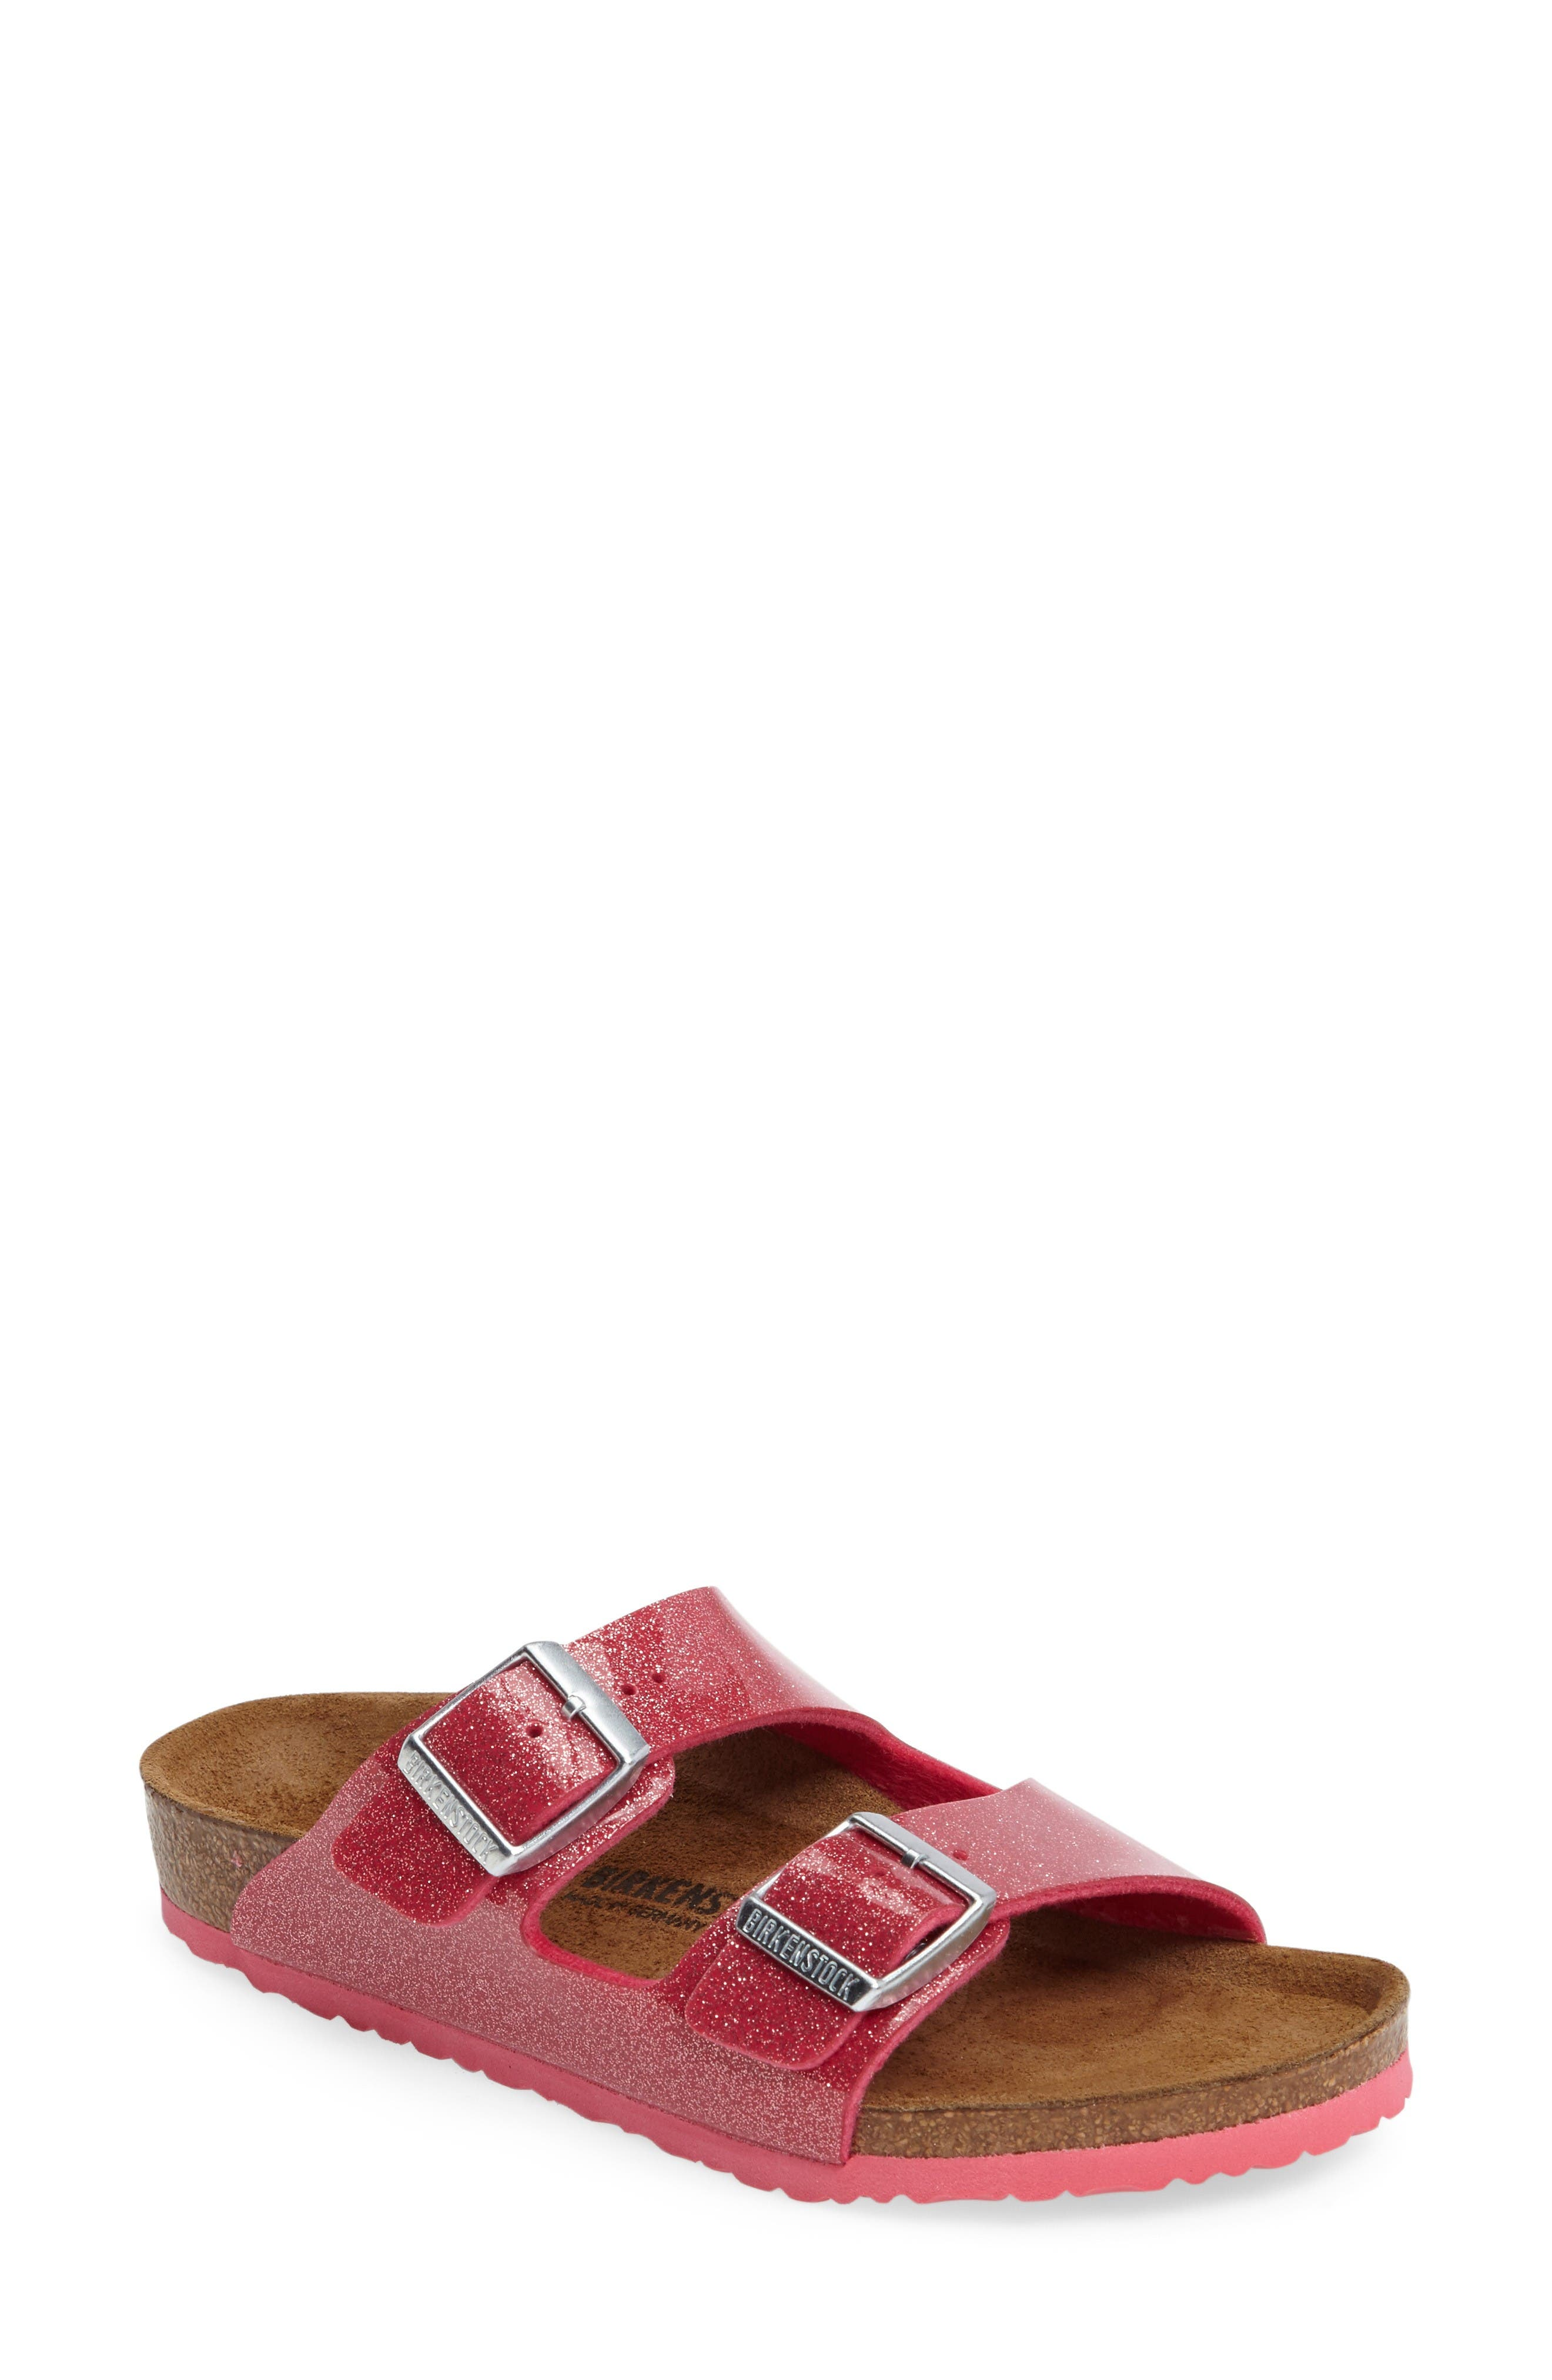 BIRKENSTOCK 'Arizona Galaxy Birko-Flor' Slide Sandal